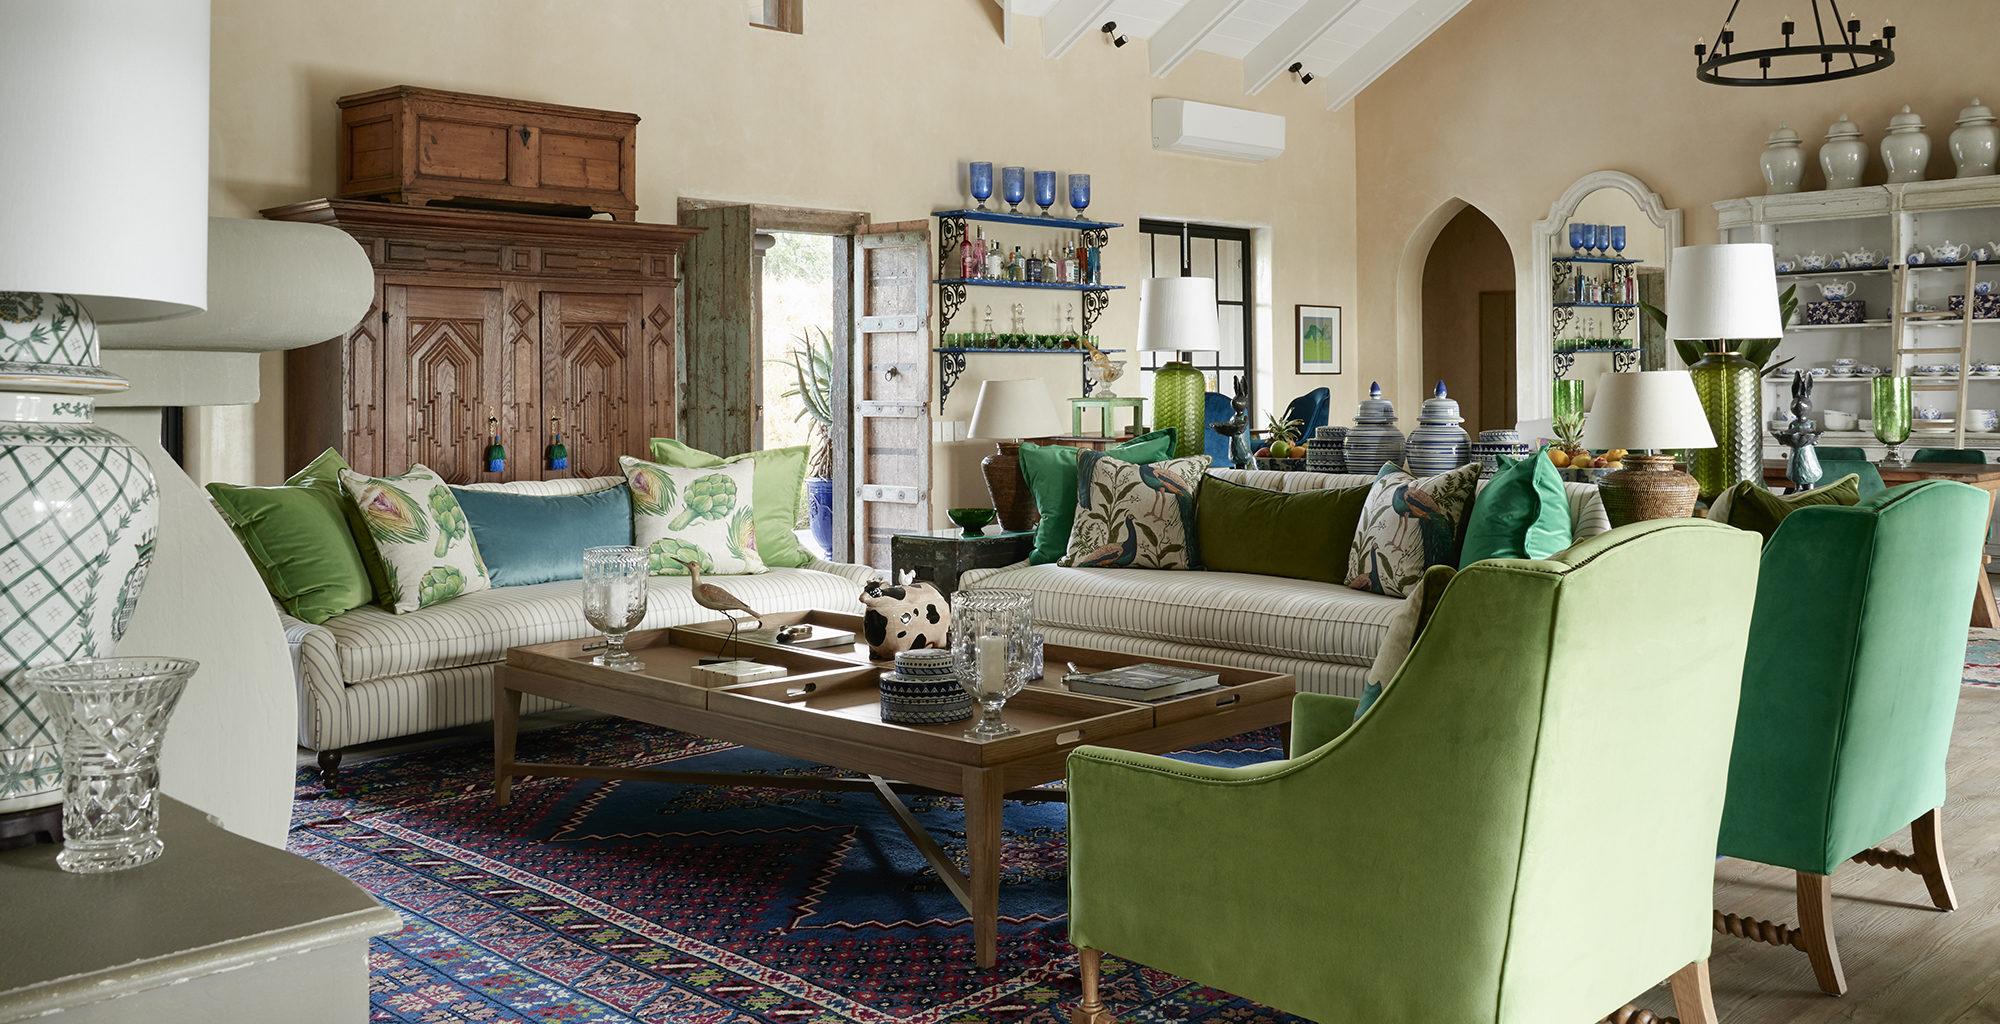 South-Africa-Farmstead-Lounge